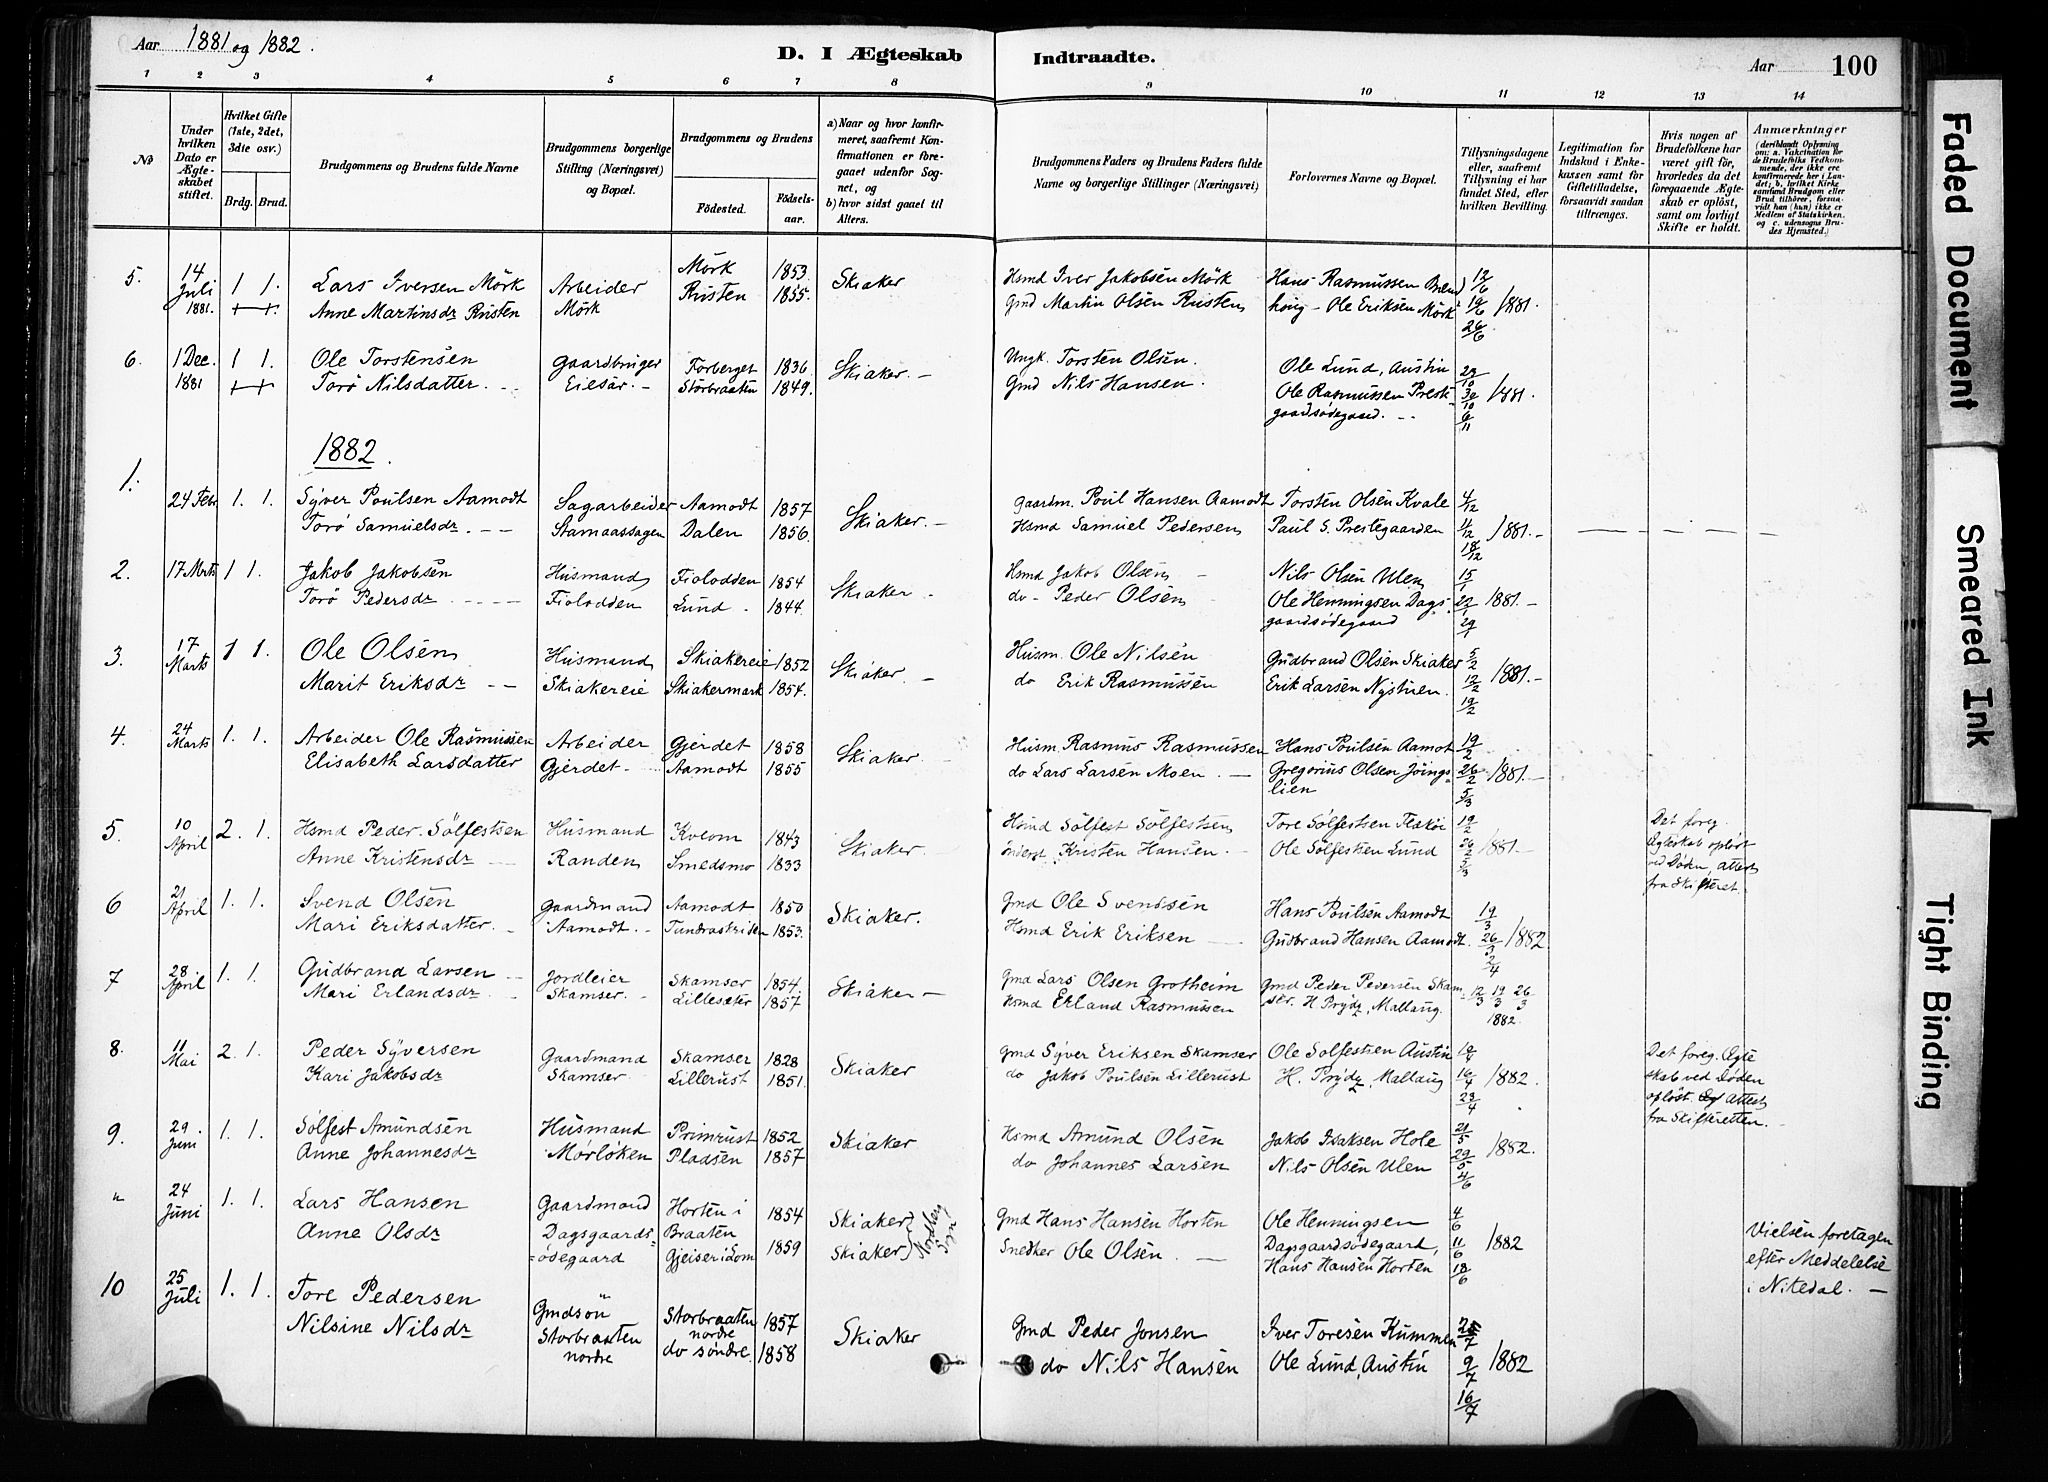 SAH, Skjåk prestekontor, Ministerialbok nr. 4, 1880-1904, s. 100